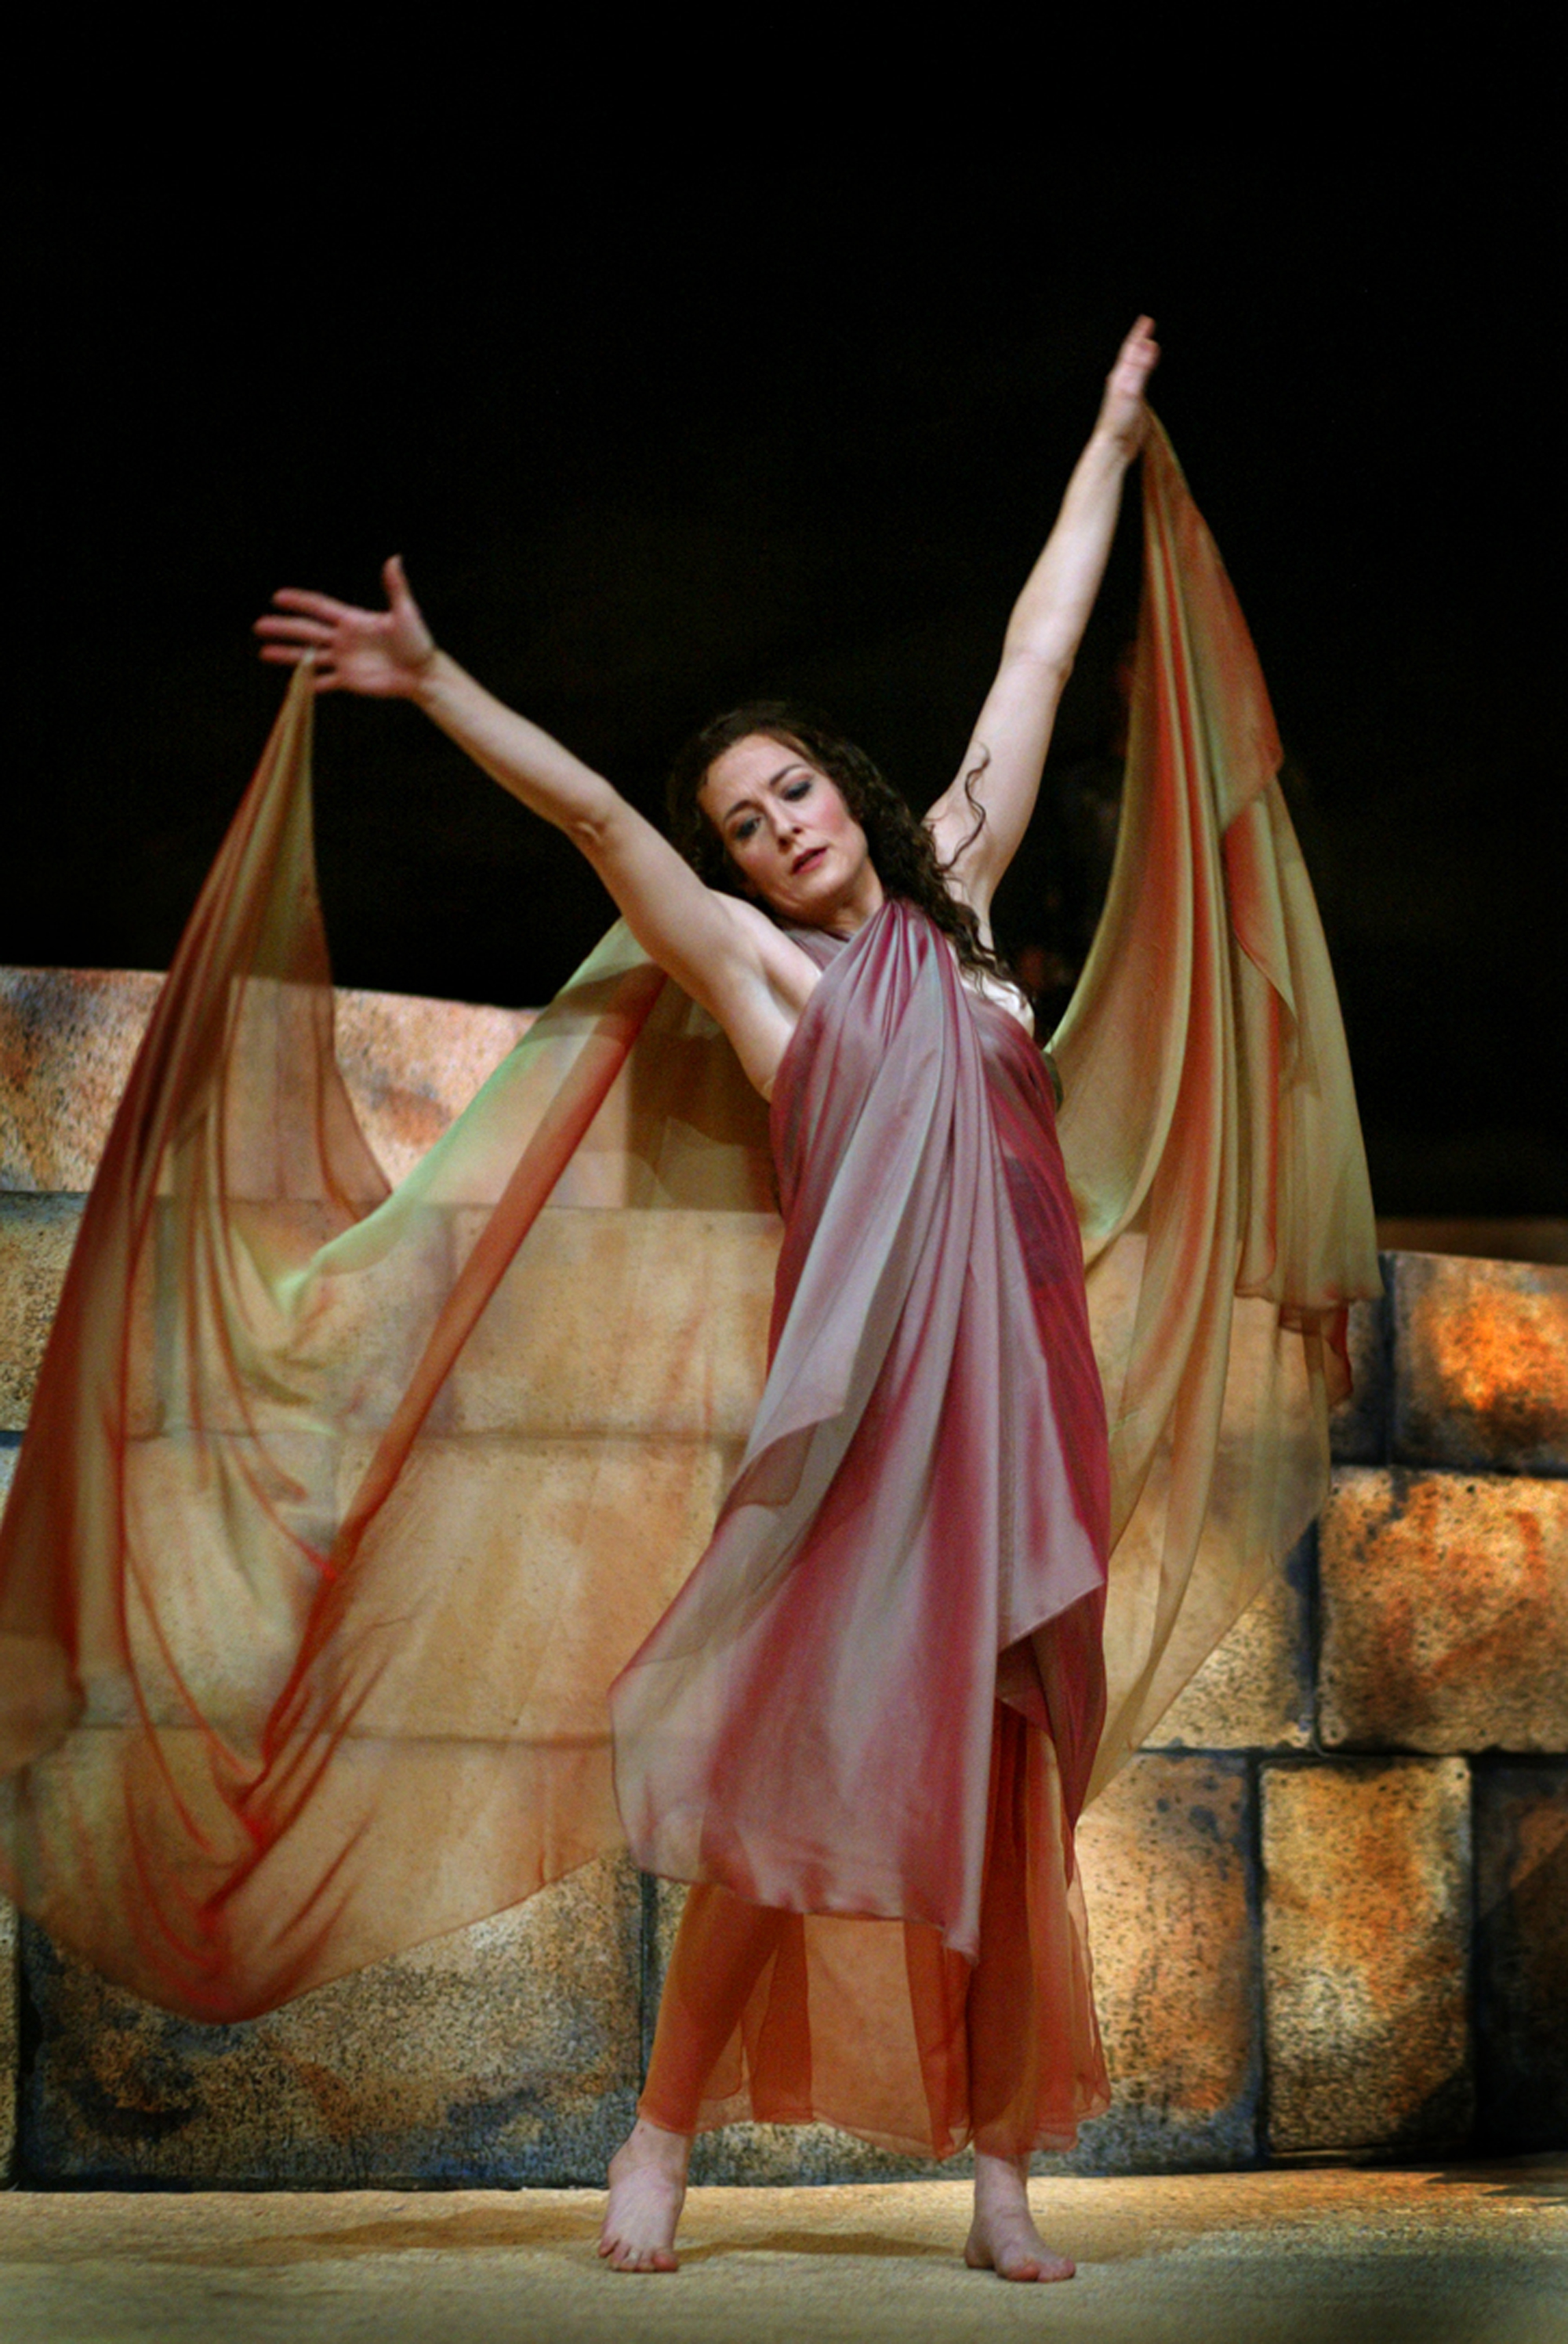 Toledo Opera S New Production Has Local Flavor Via Set